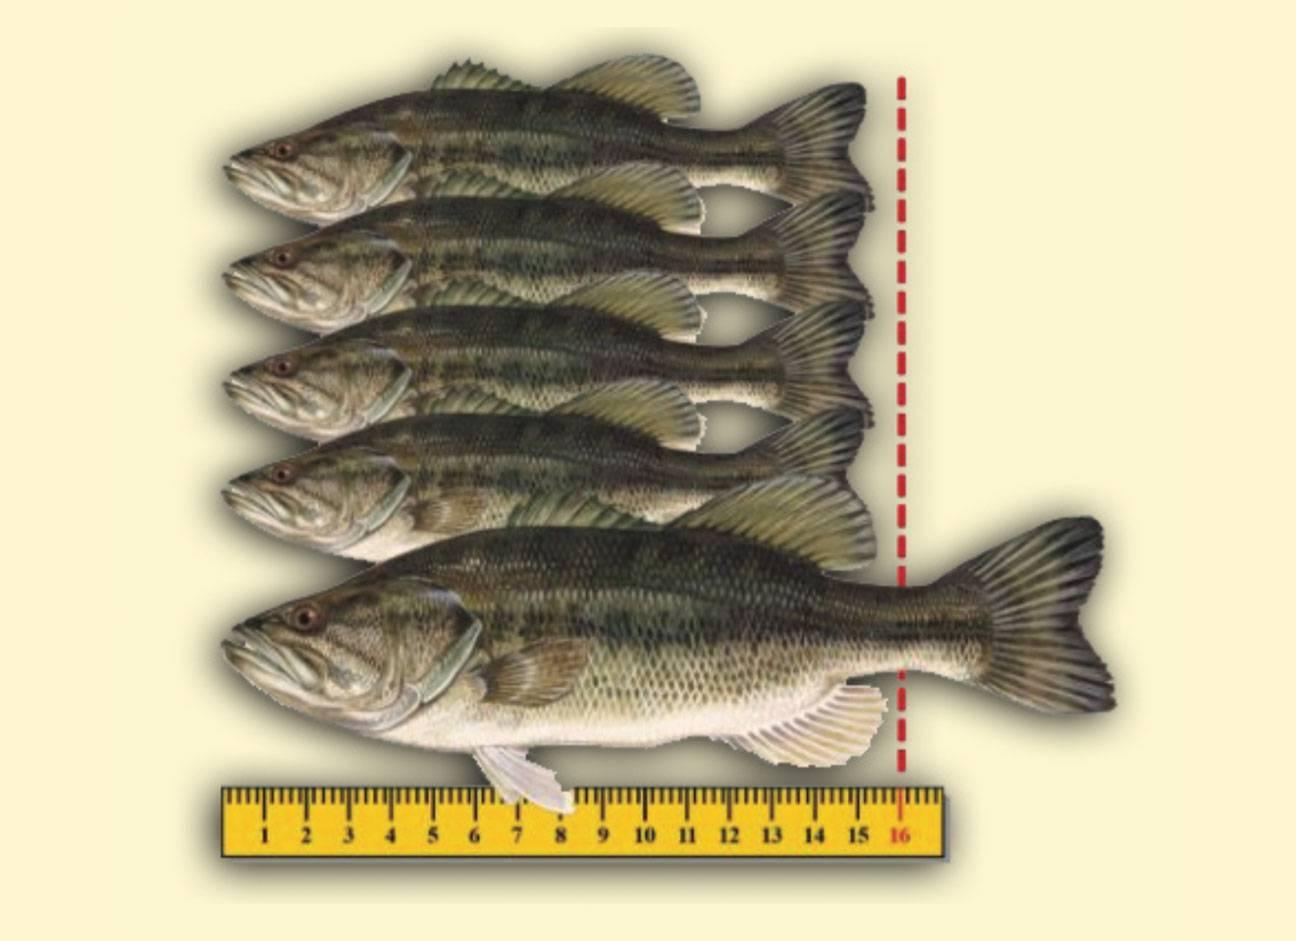 Florida s new largemouth bass regulations coastal angler for Ri fishing regulations